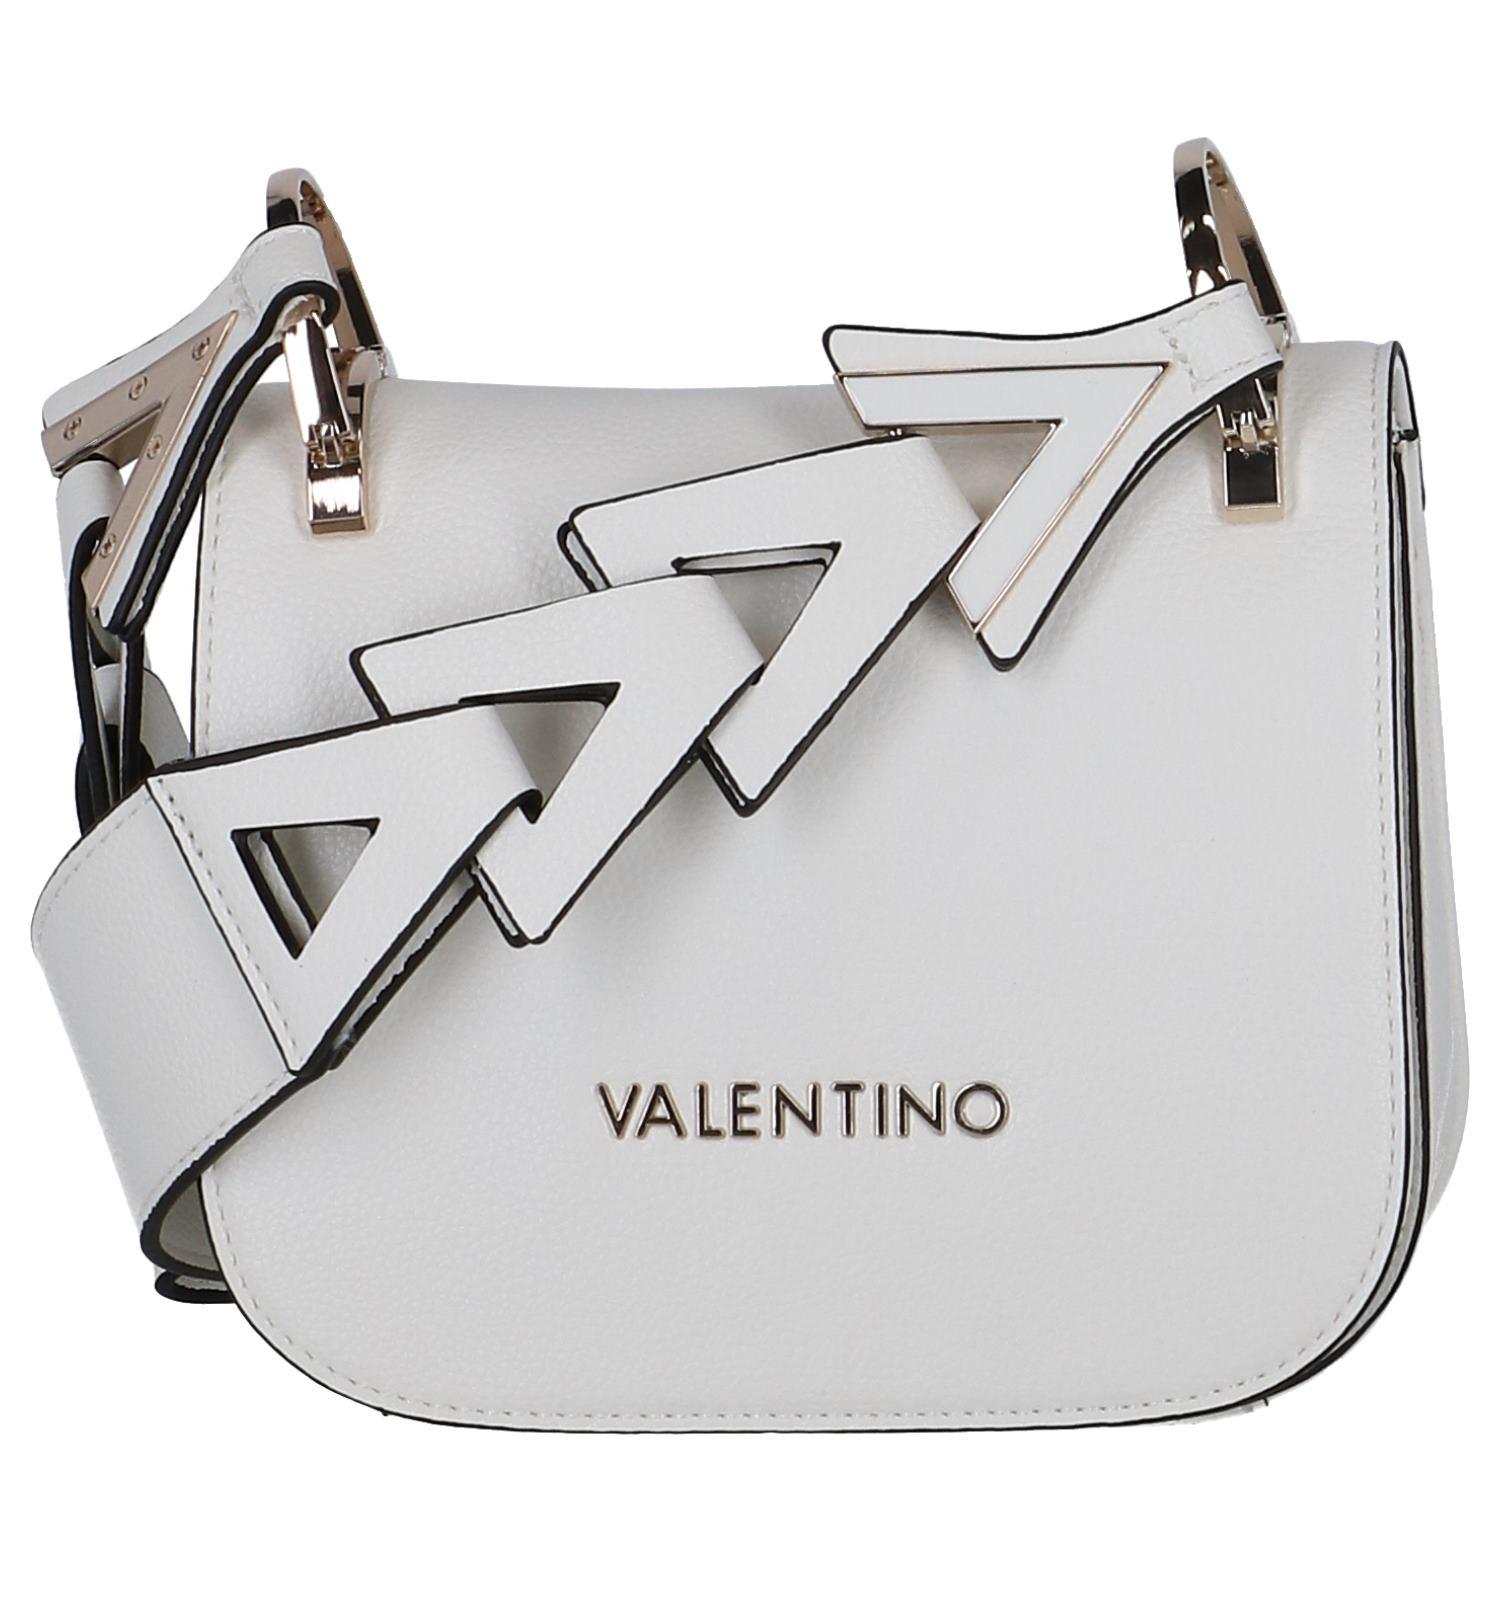 Handbags Valentino be Retour En Tas Gratis Crossbody Witte ZootropolisTorfs Verzend W9IDeYEH2